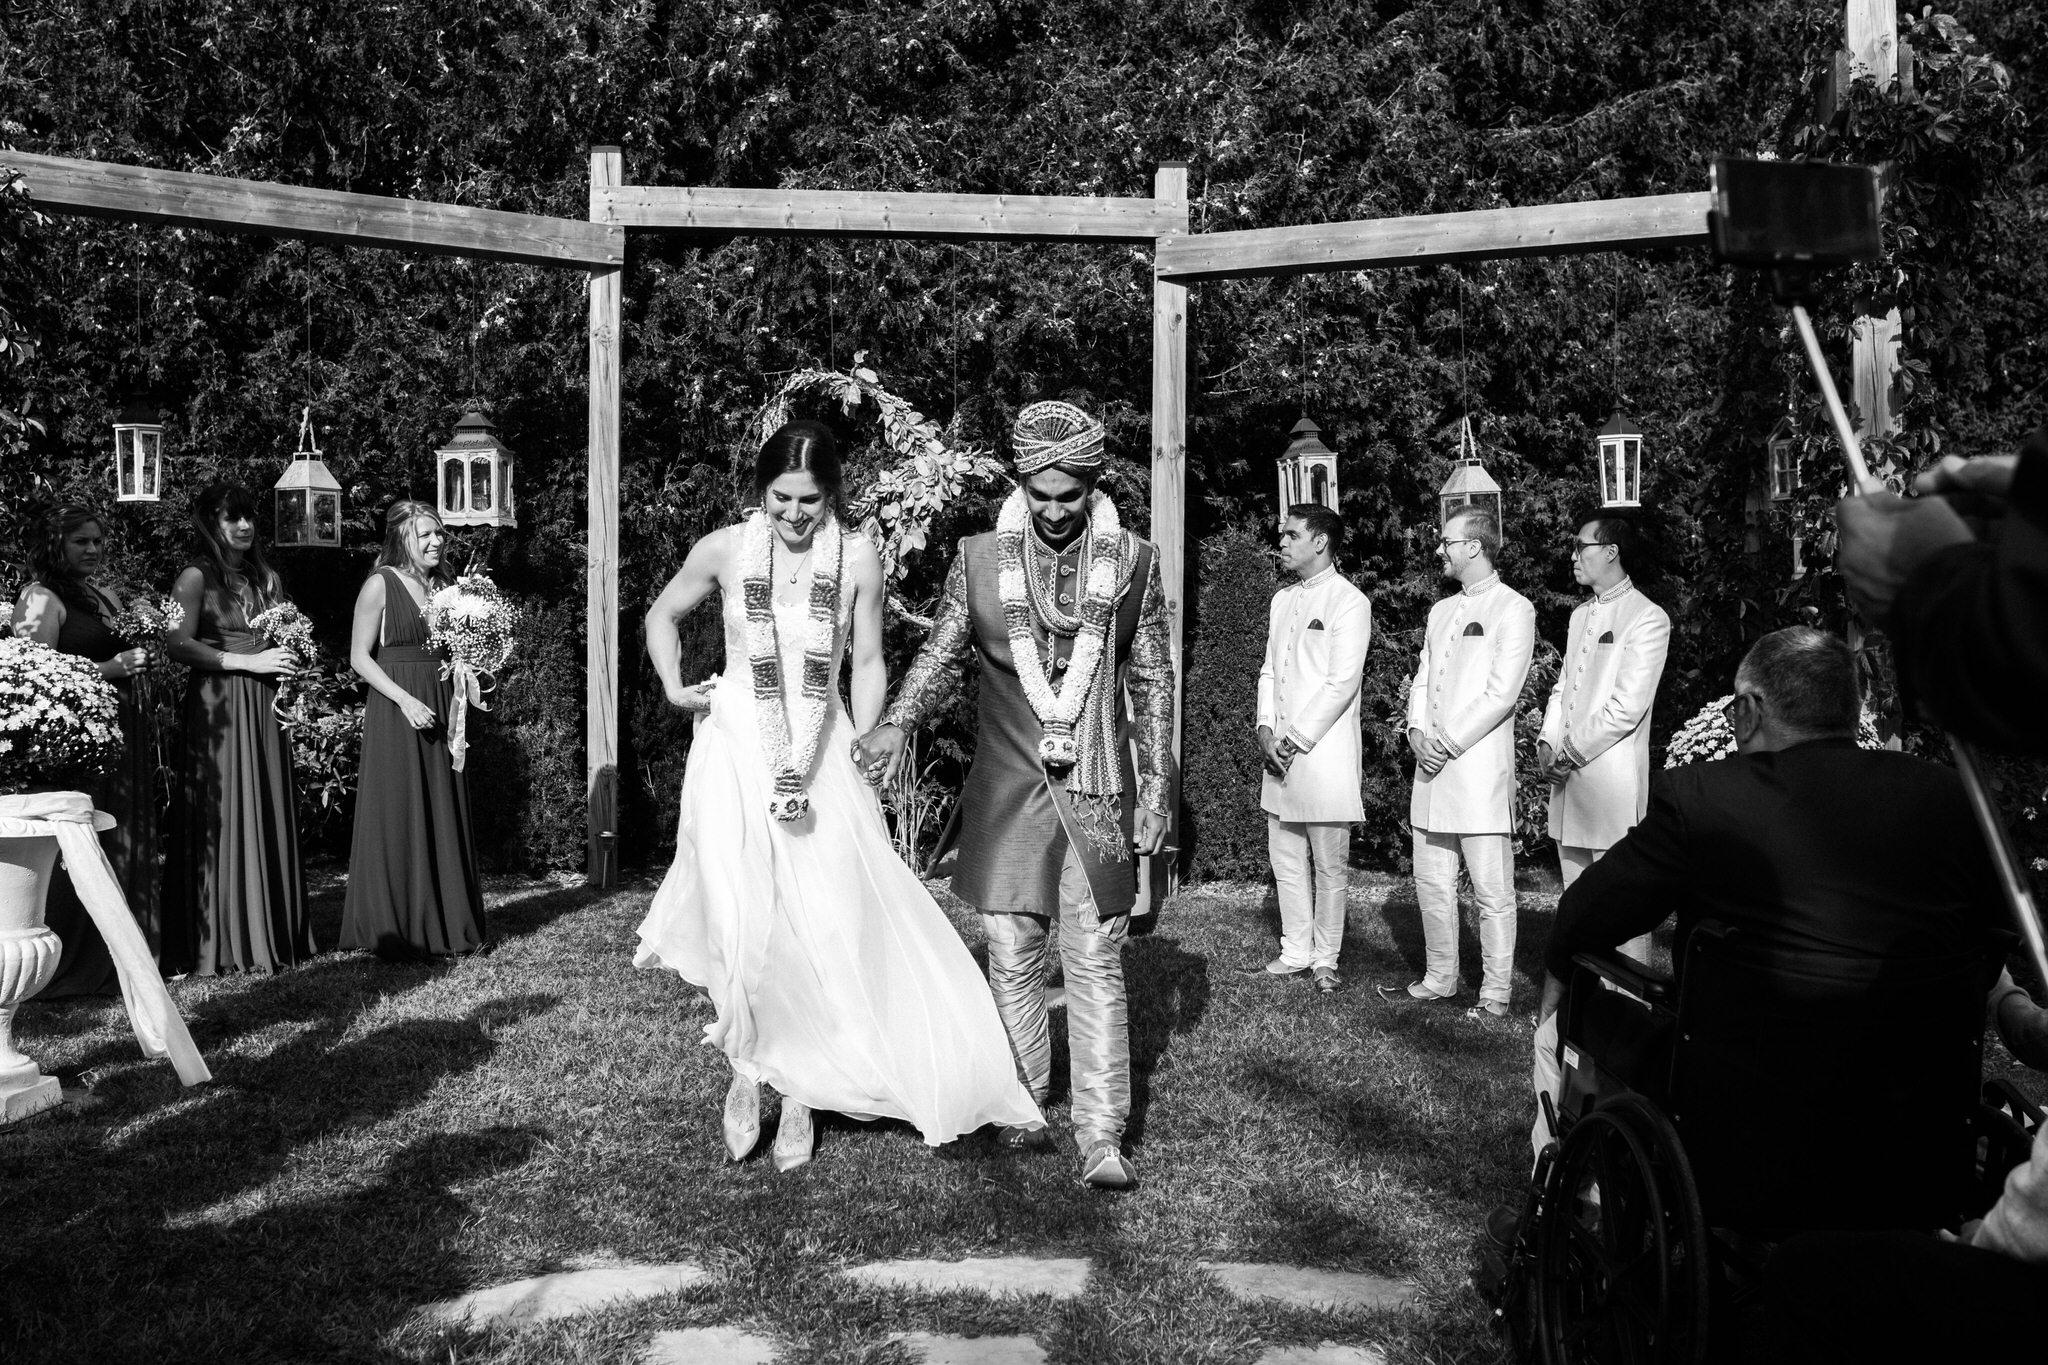 Northview Gardens Wedding - newlyweds - hindu wedding